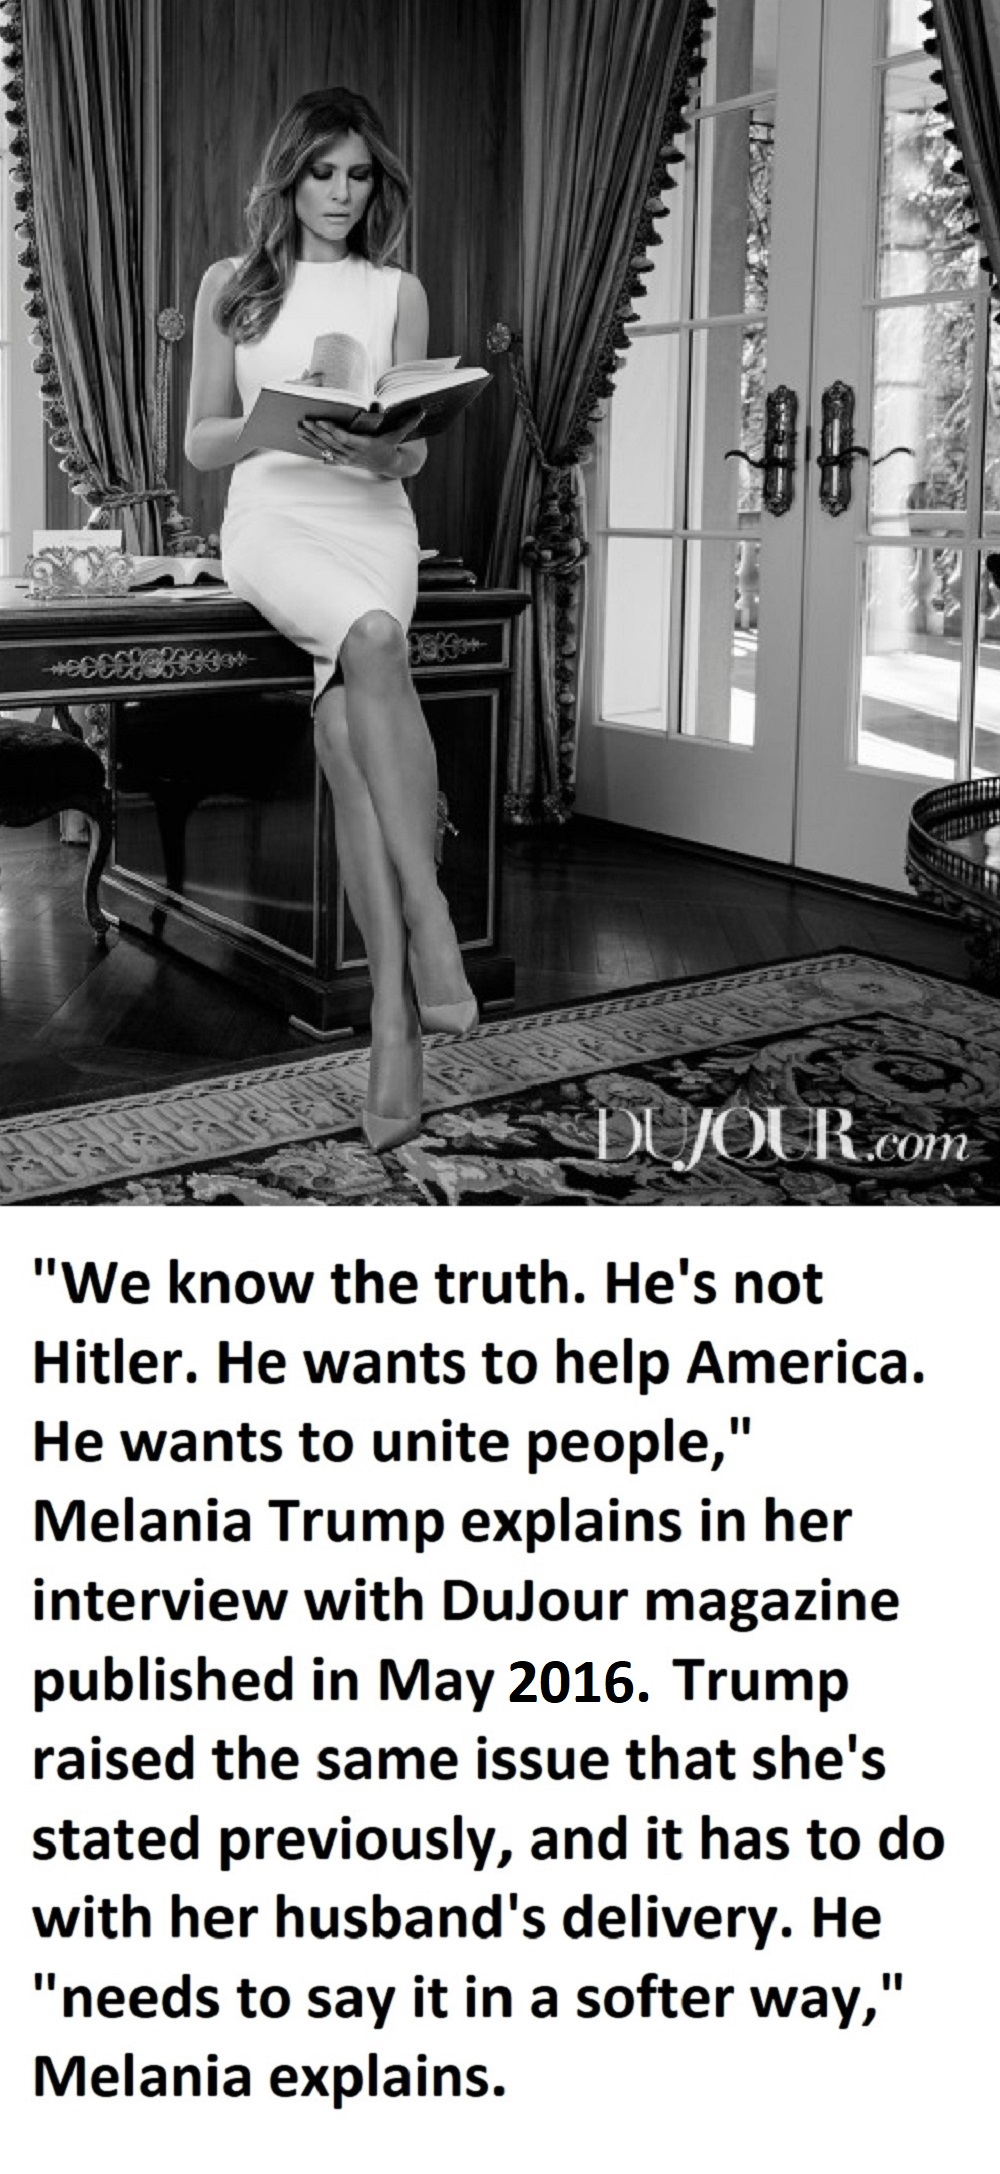 1-Melania+Trump+says+Donald+Trump+is+not+Hitler+text (1).jpg